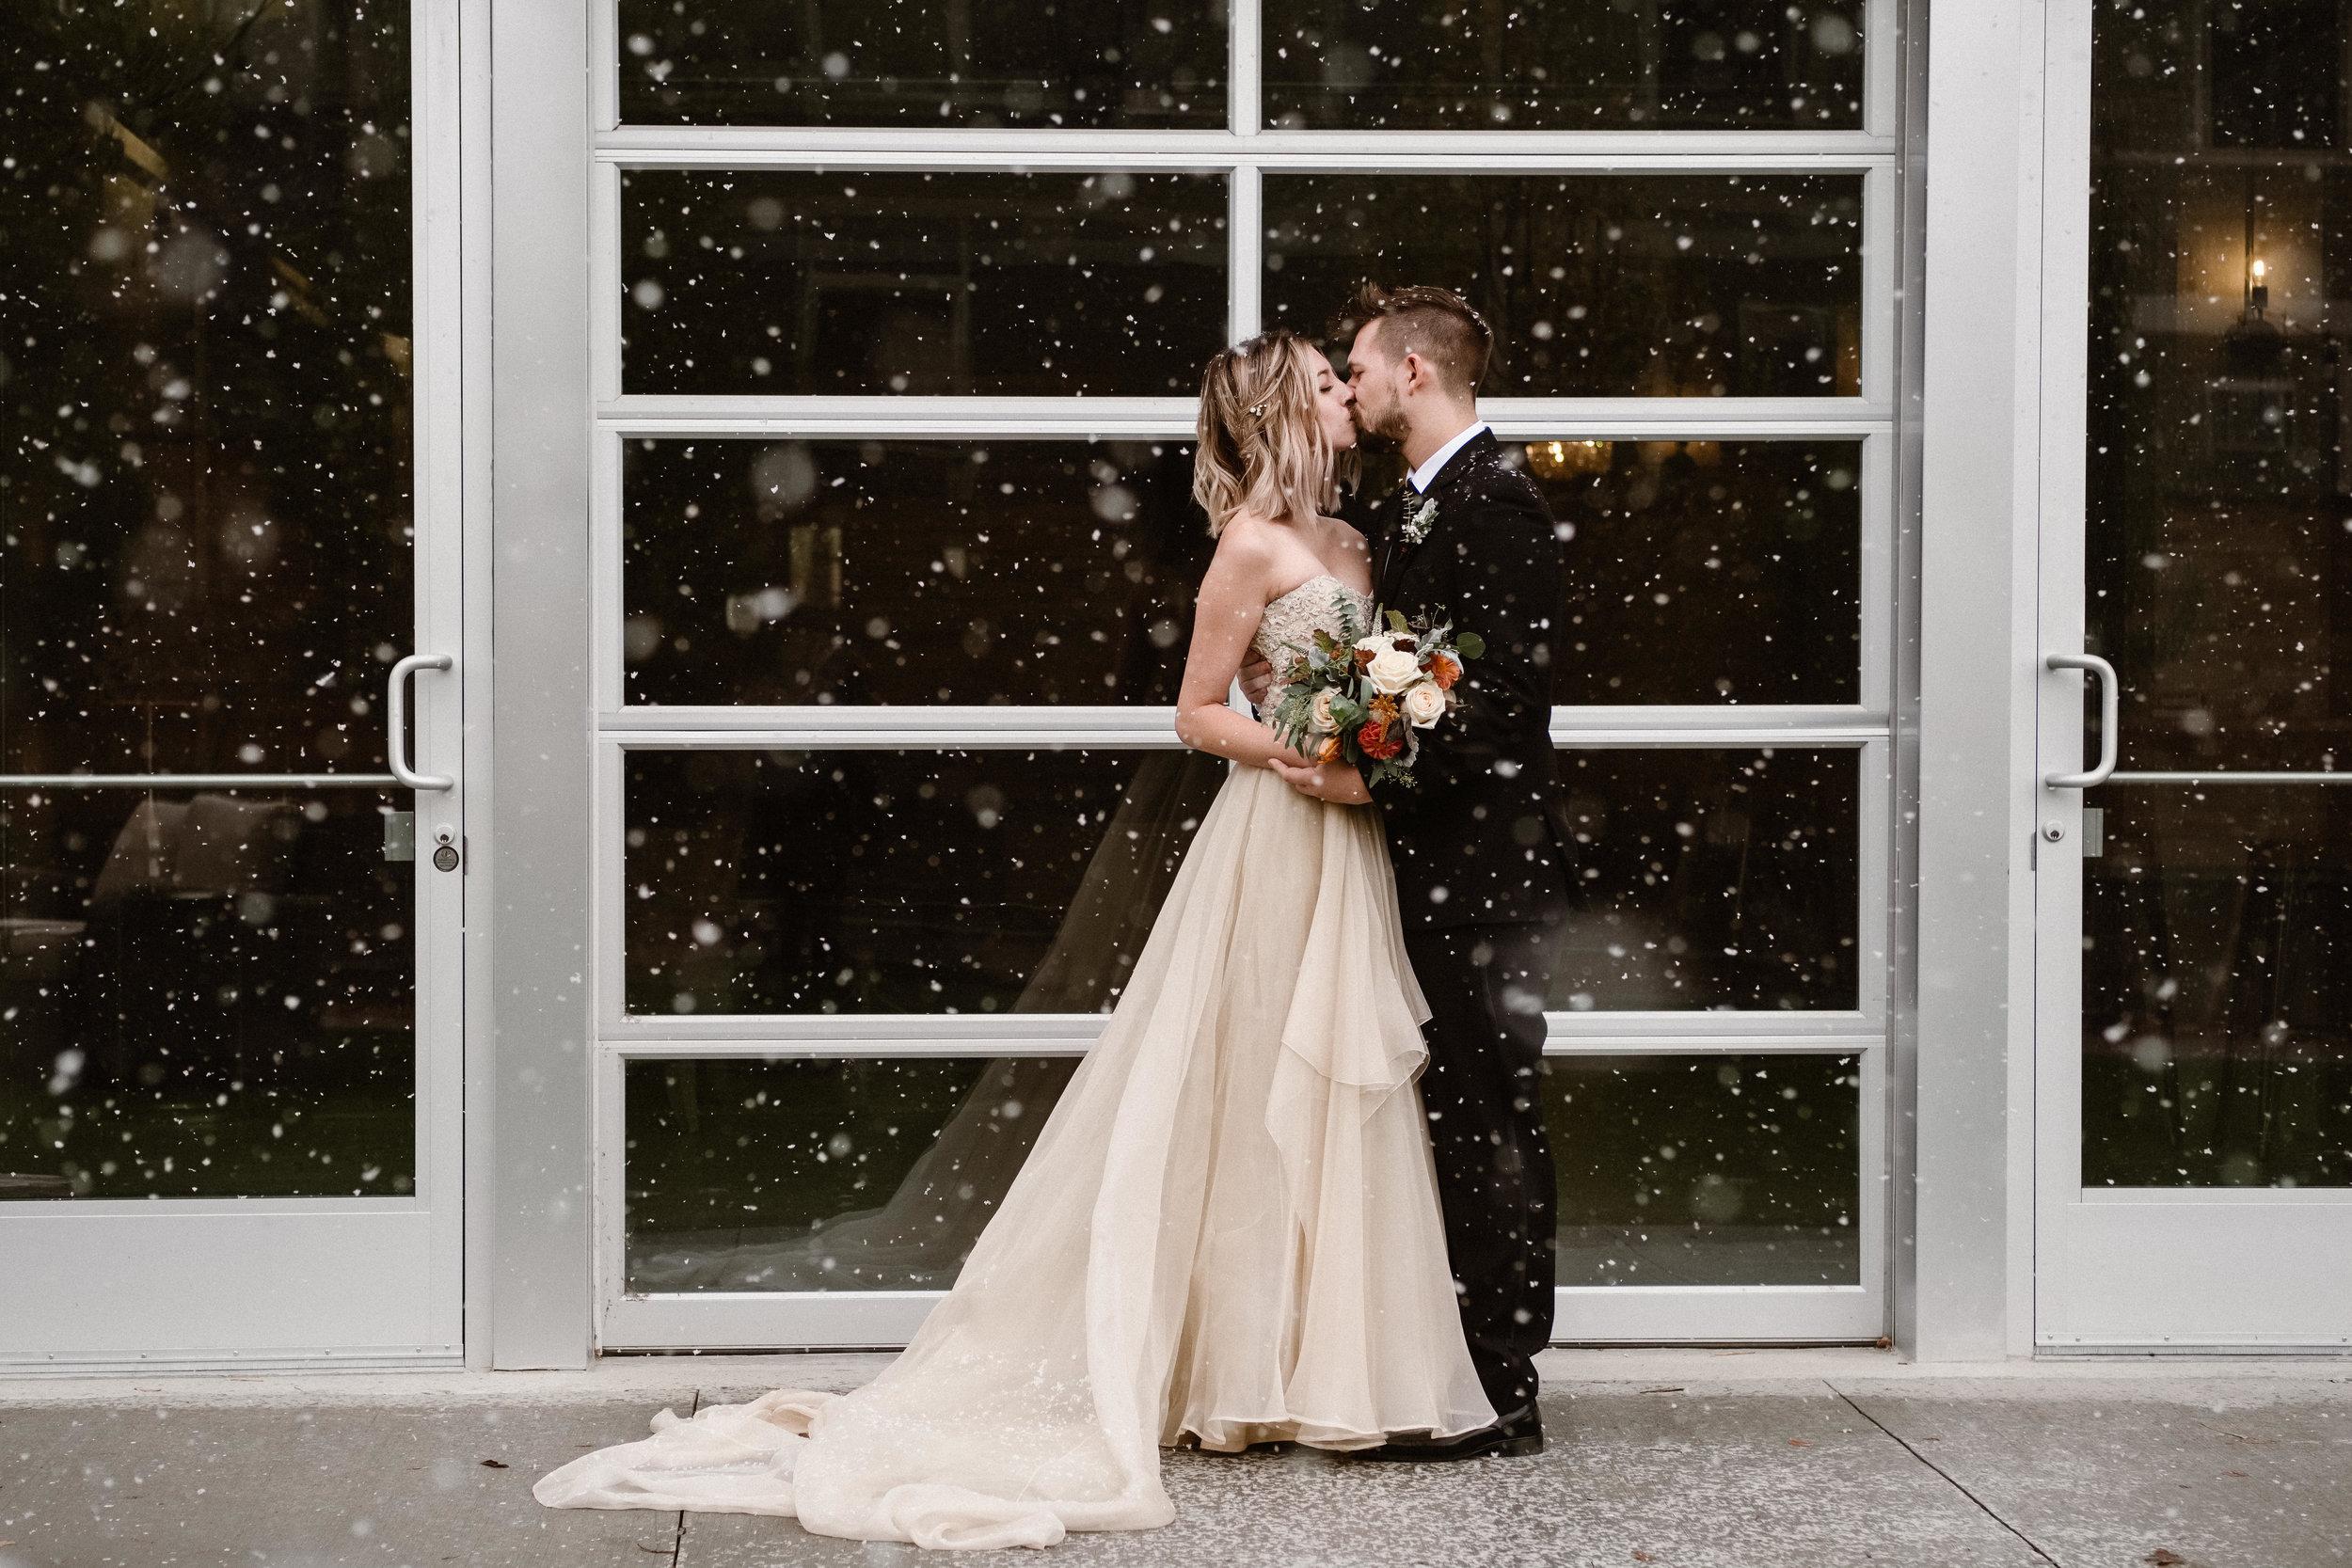 emma-caleb-st-vrain-wedding-3-89.jpg